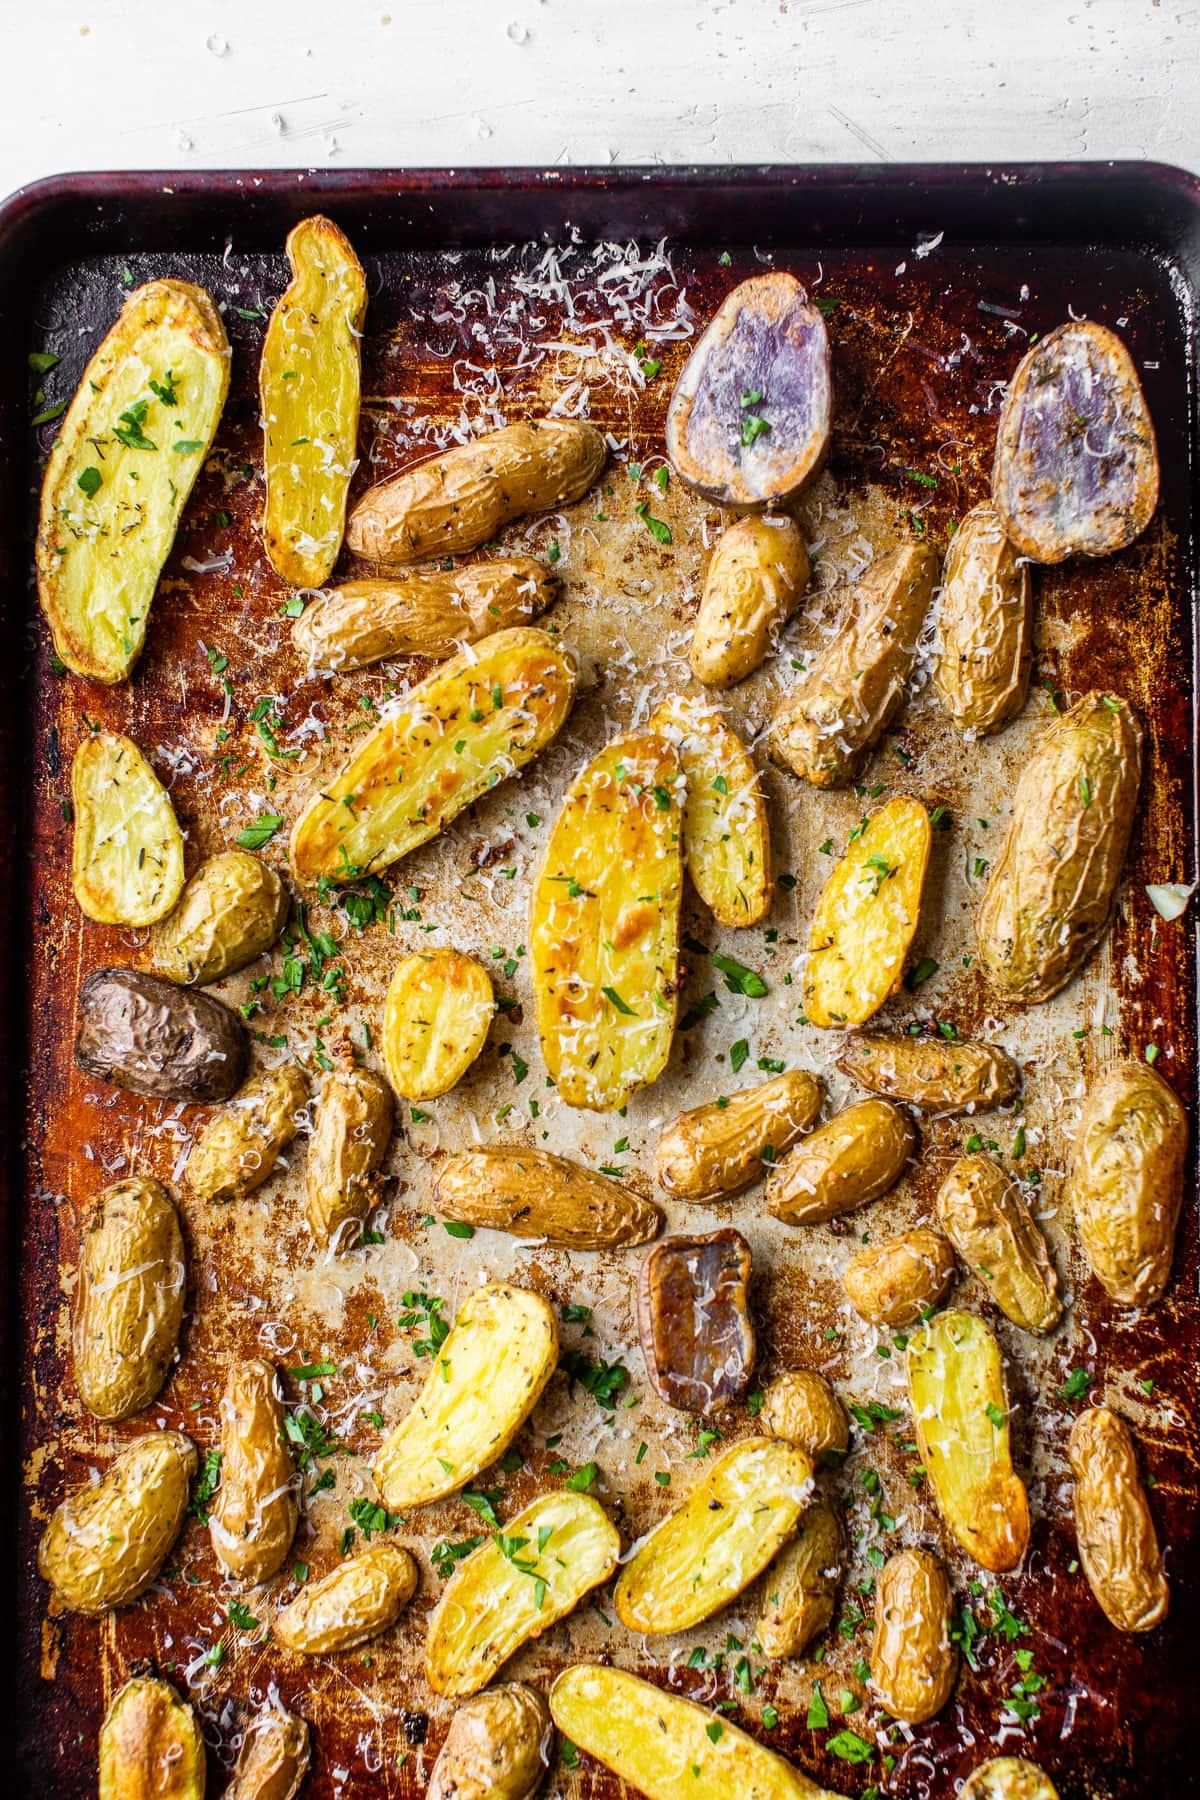 Roasted fingerling potatoes on a baking sheet